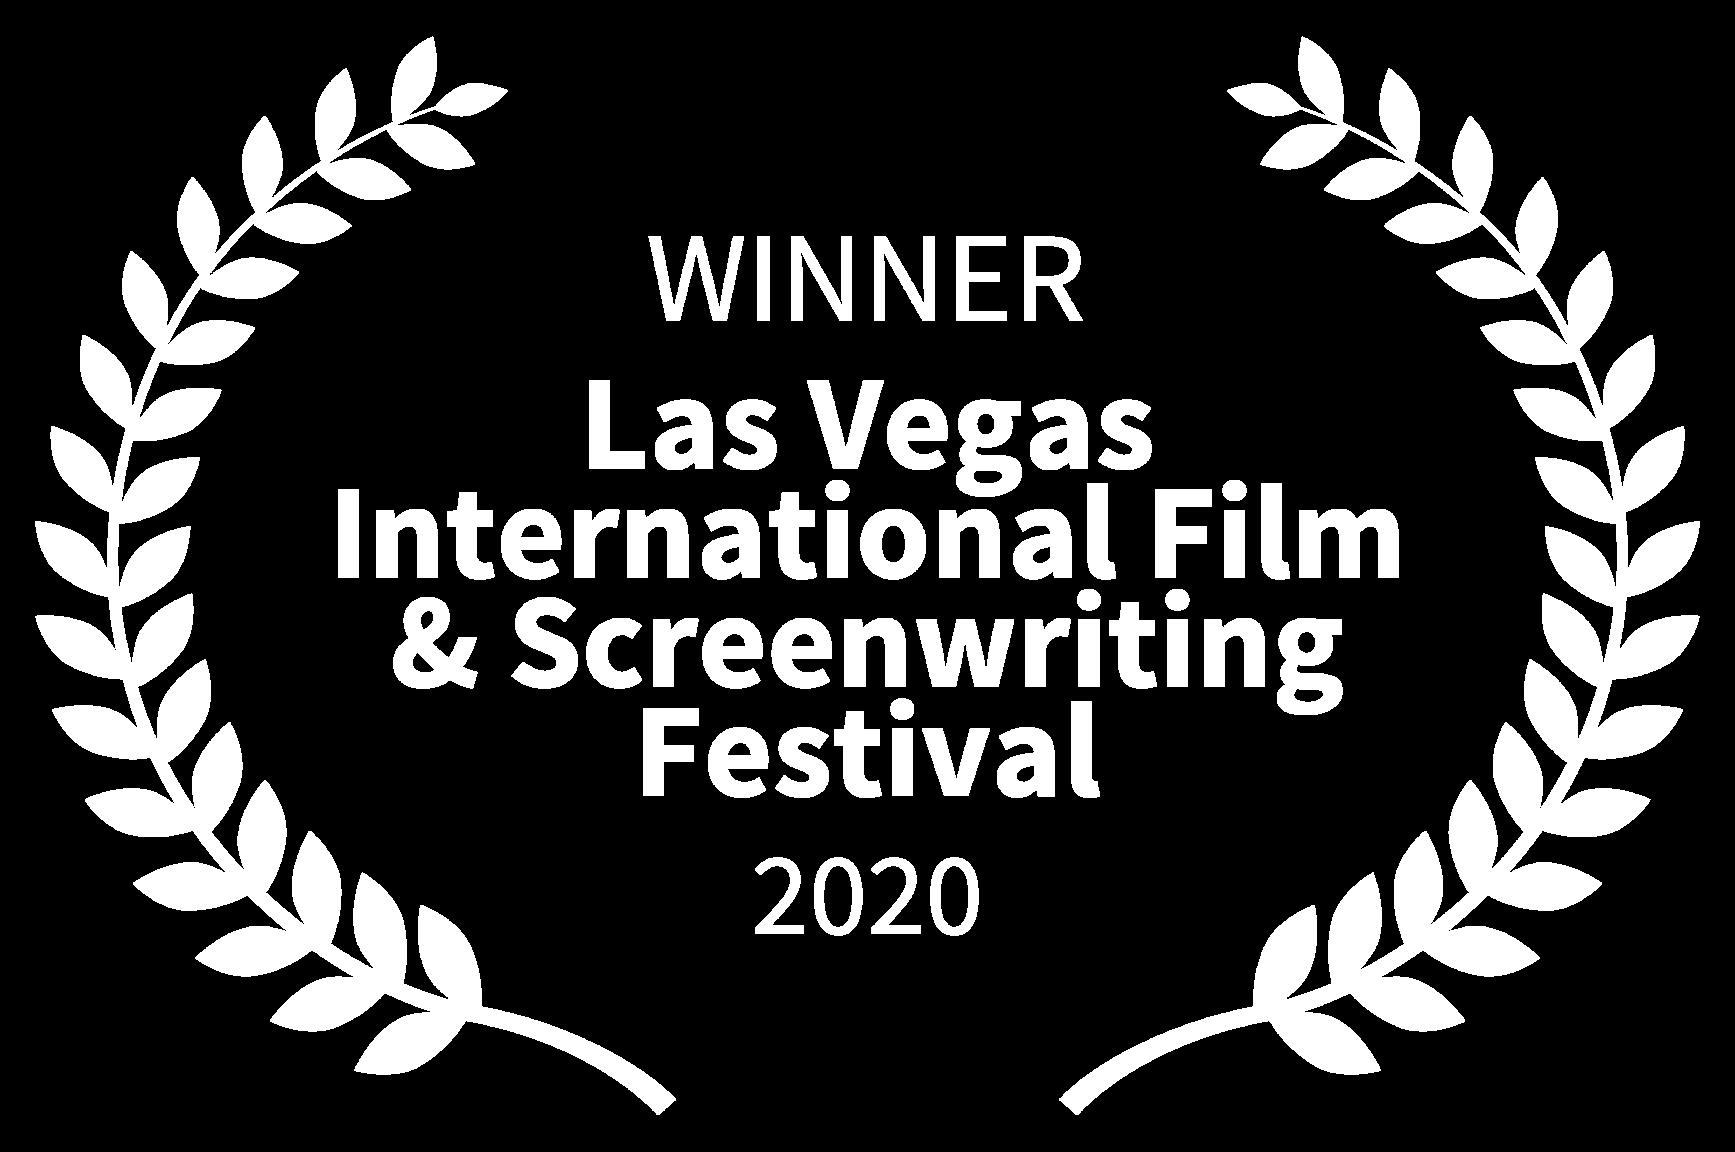 WINNER - Las Vegas International Film Screenwriting Festival - 2020